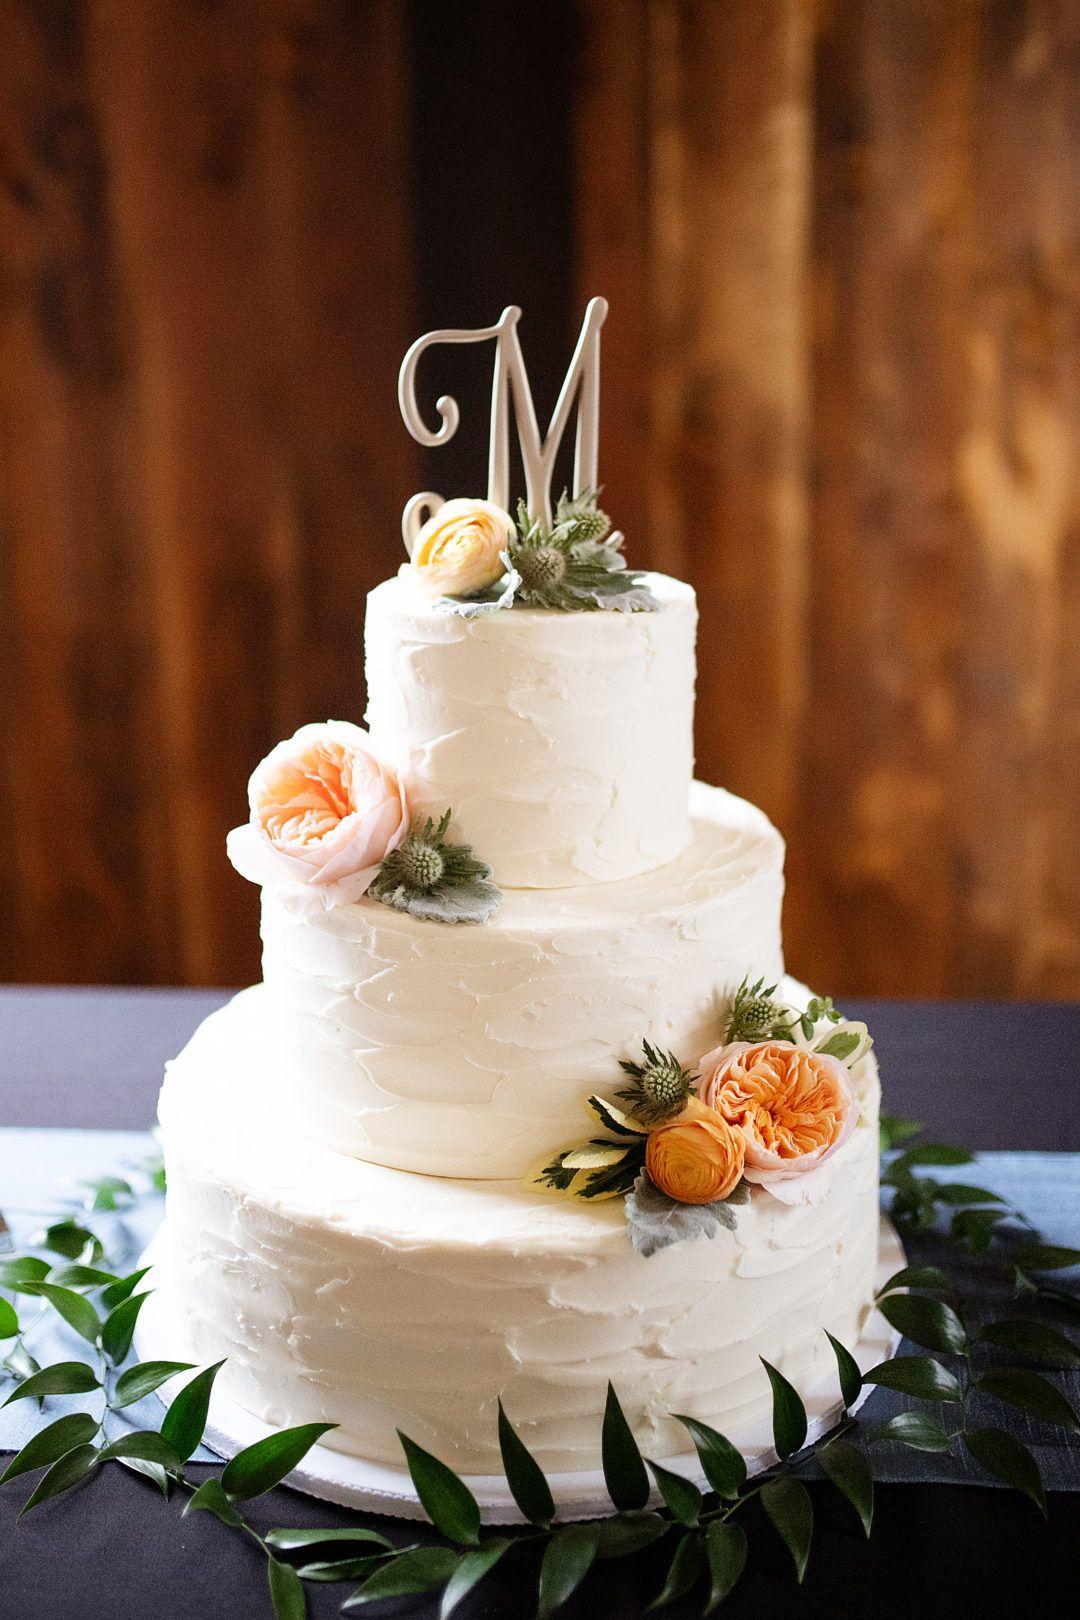 An elegant white wedding cake with soft orange and green